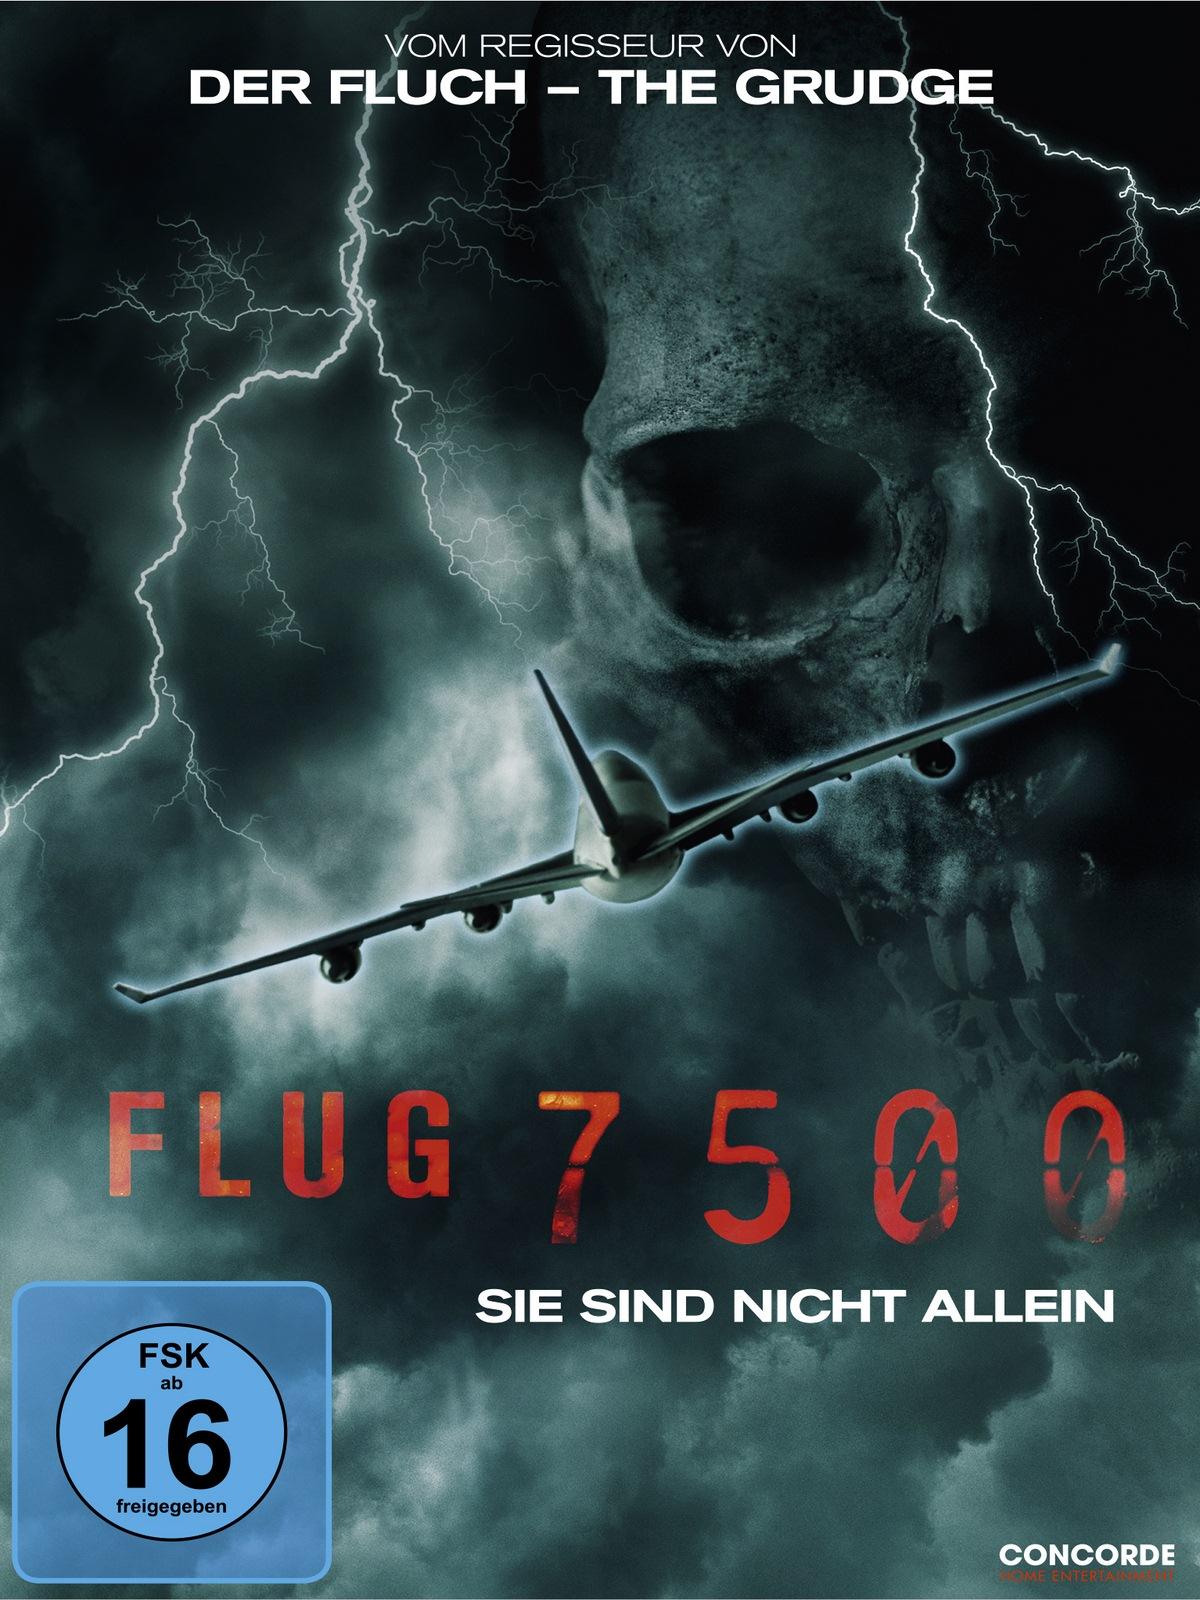 Uçuş 7500 2014 filmi full hd izle - ultrahdfilmizle.org